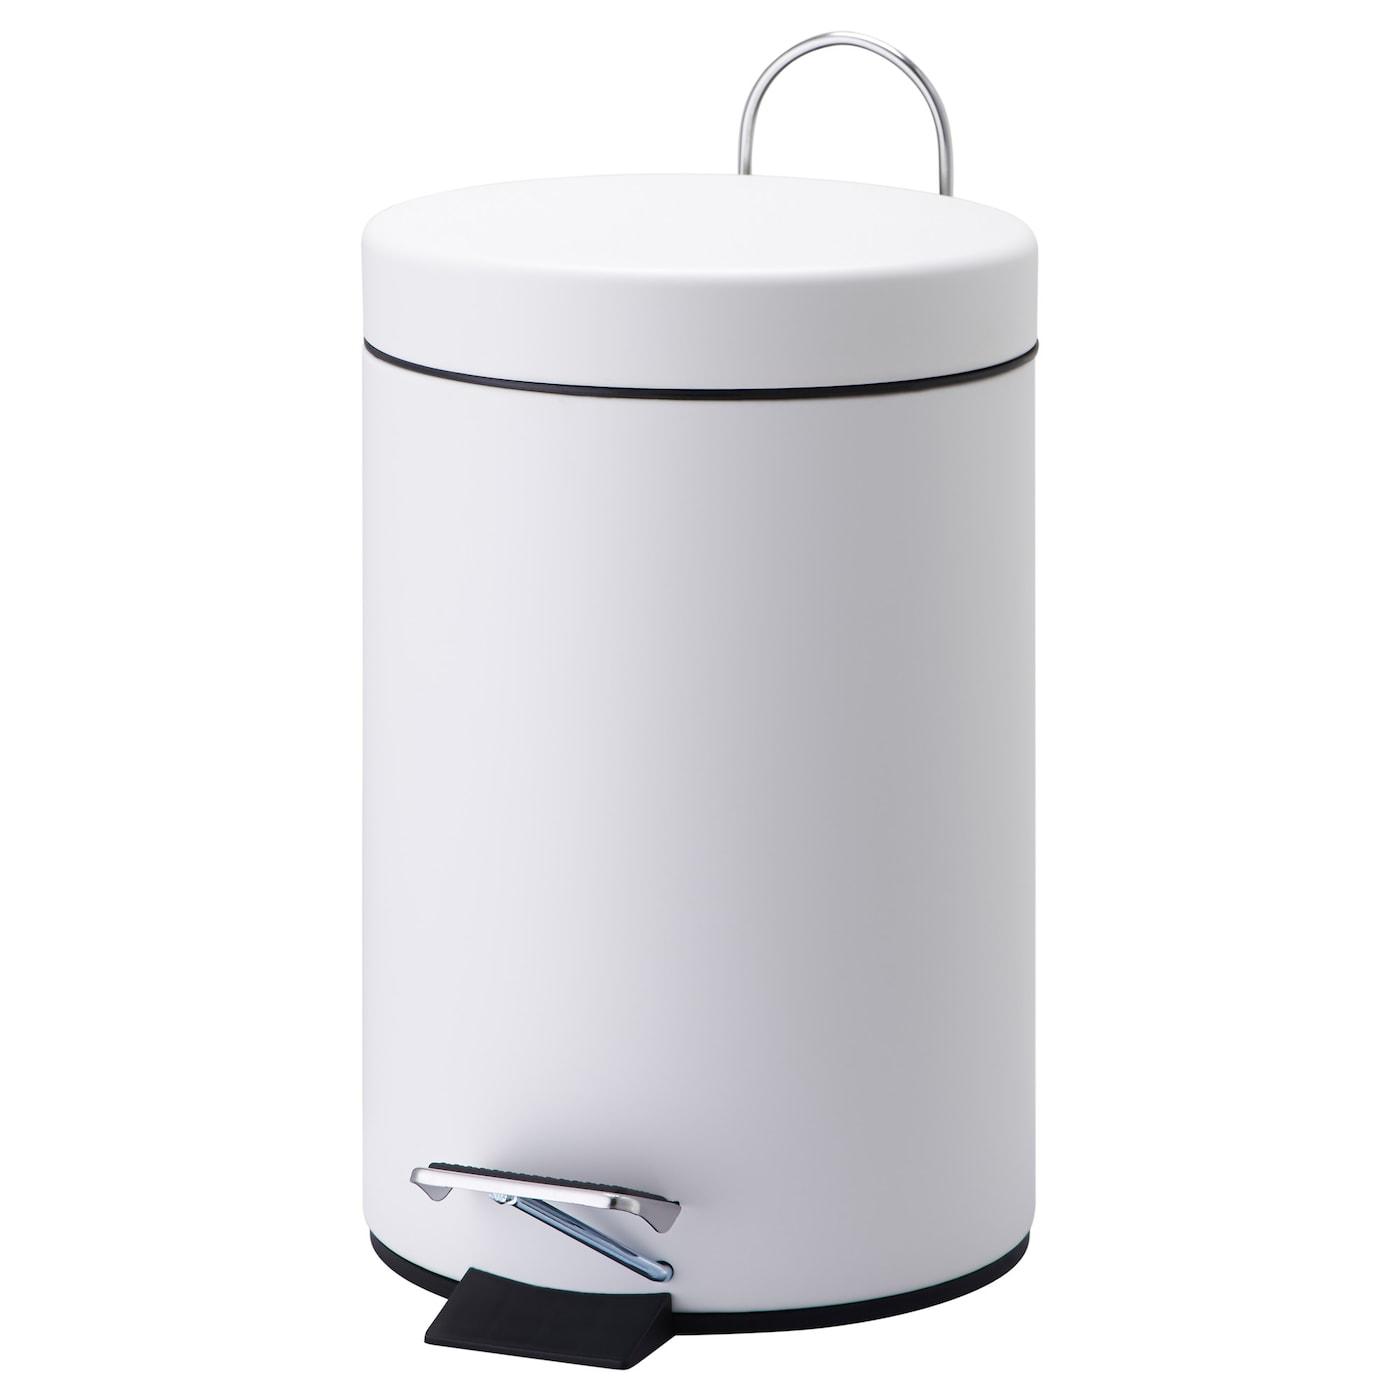 VORGOD ヴォルゴド ペダル式ゴミ箱